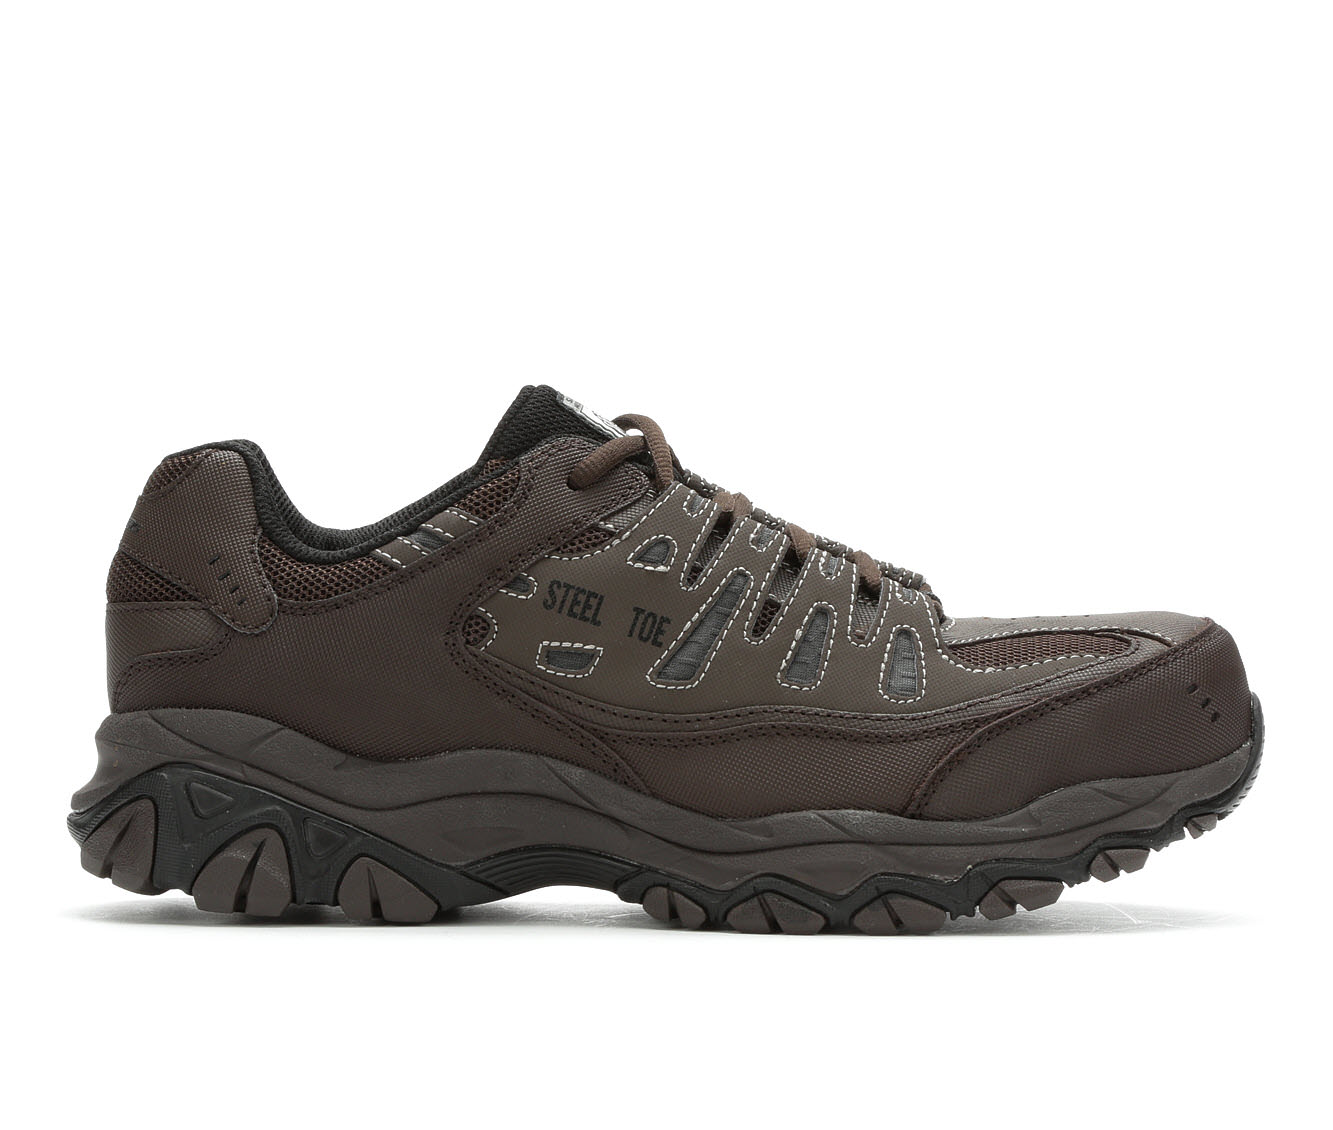 Skechers Work 77055 Cankton Steel Toe Men's Boots (Brown Canvas)